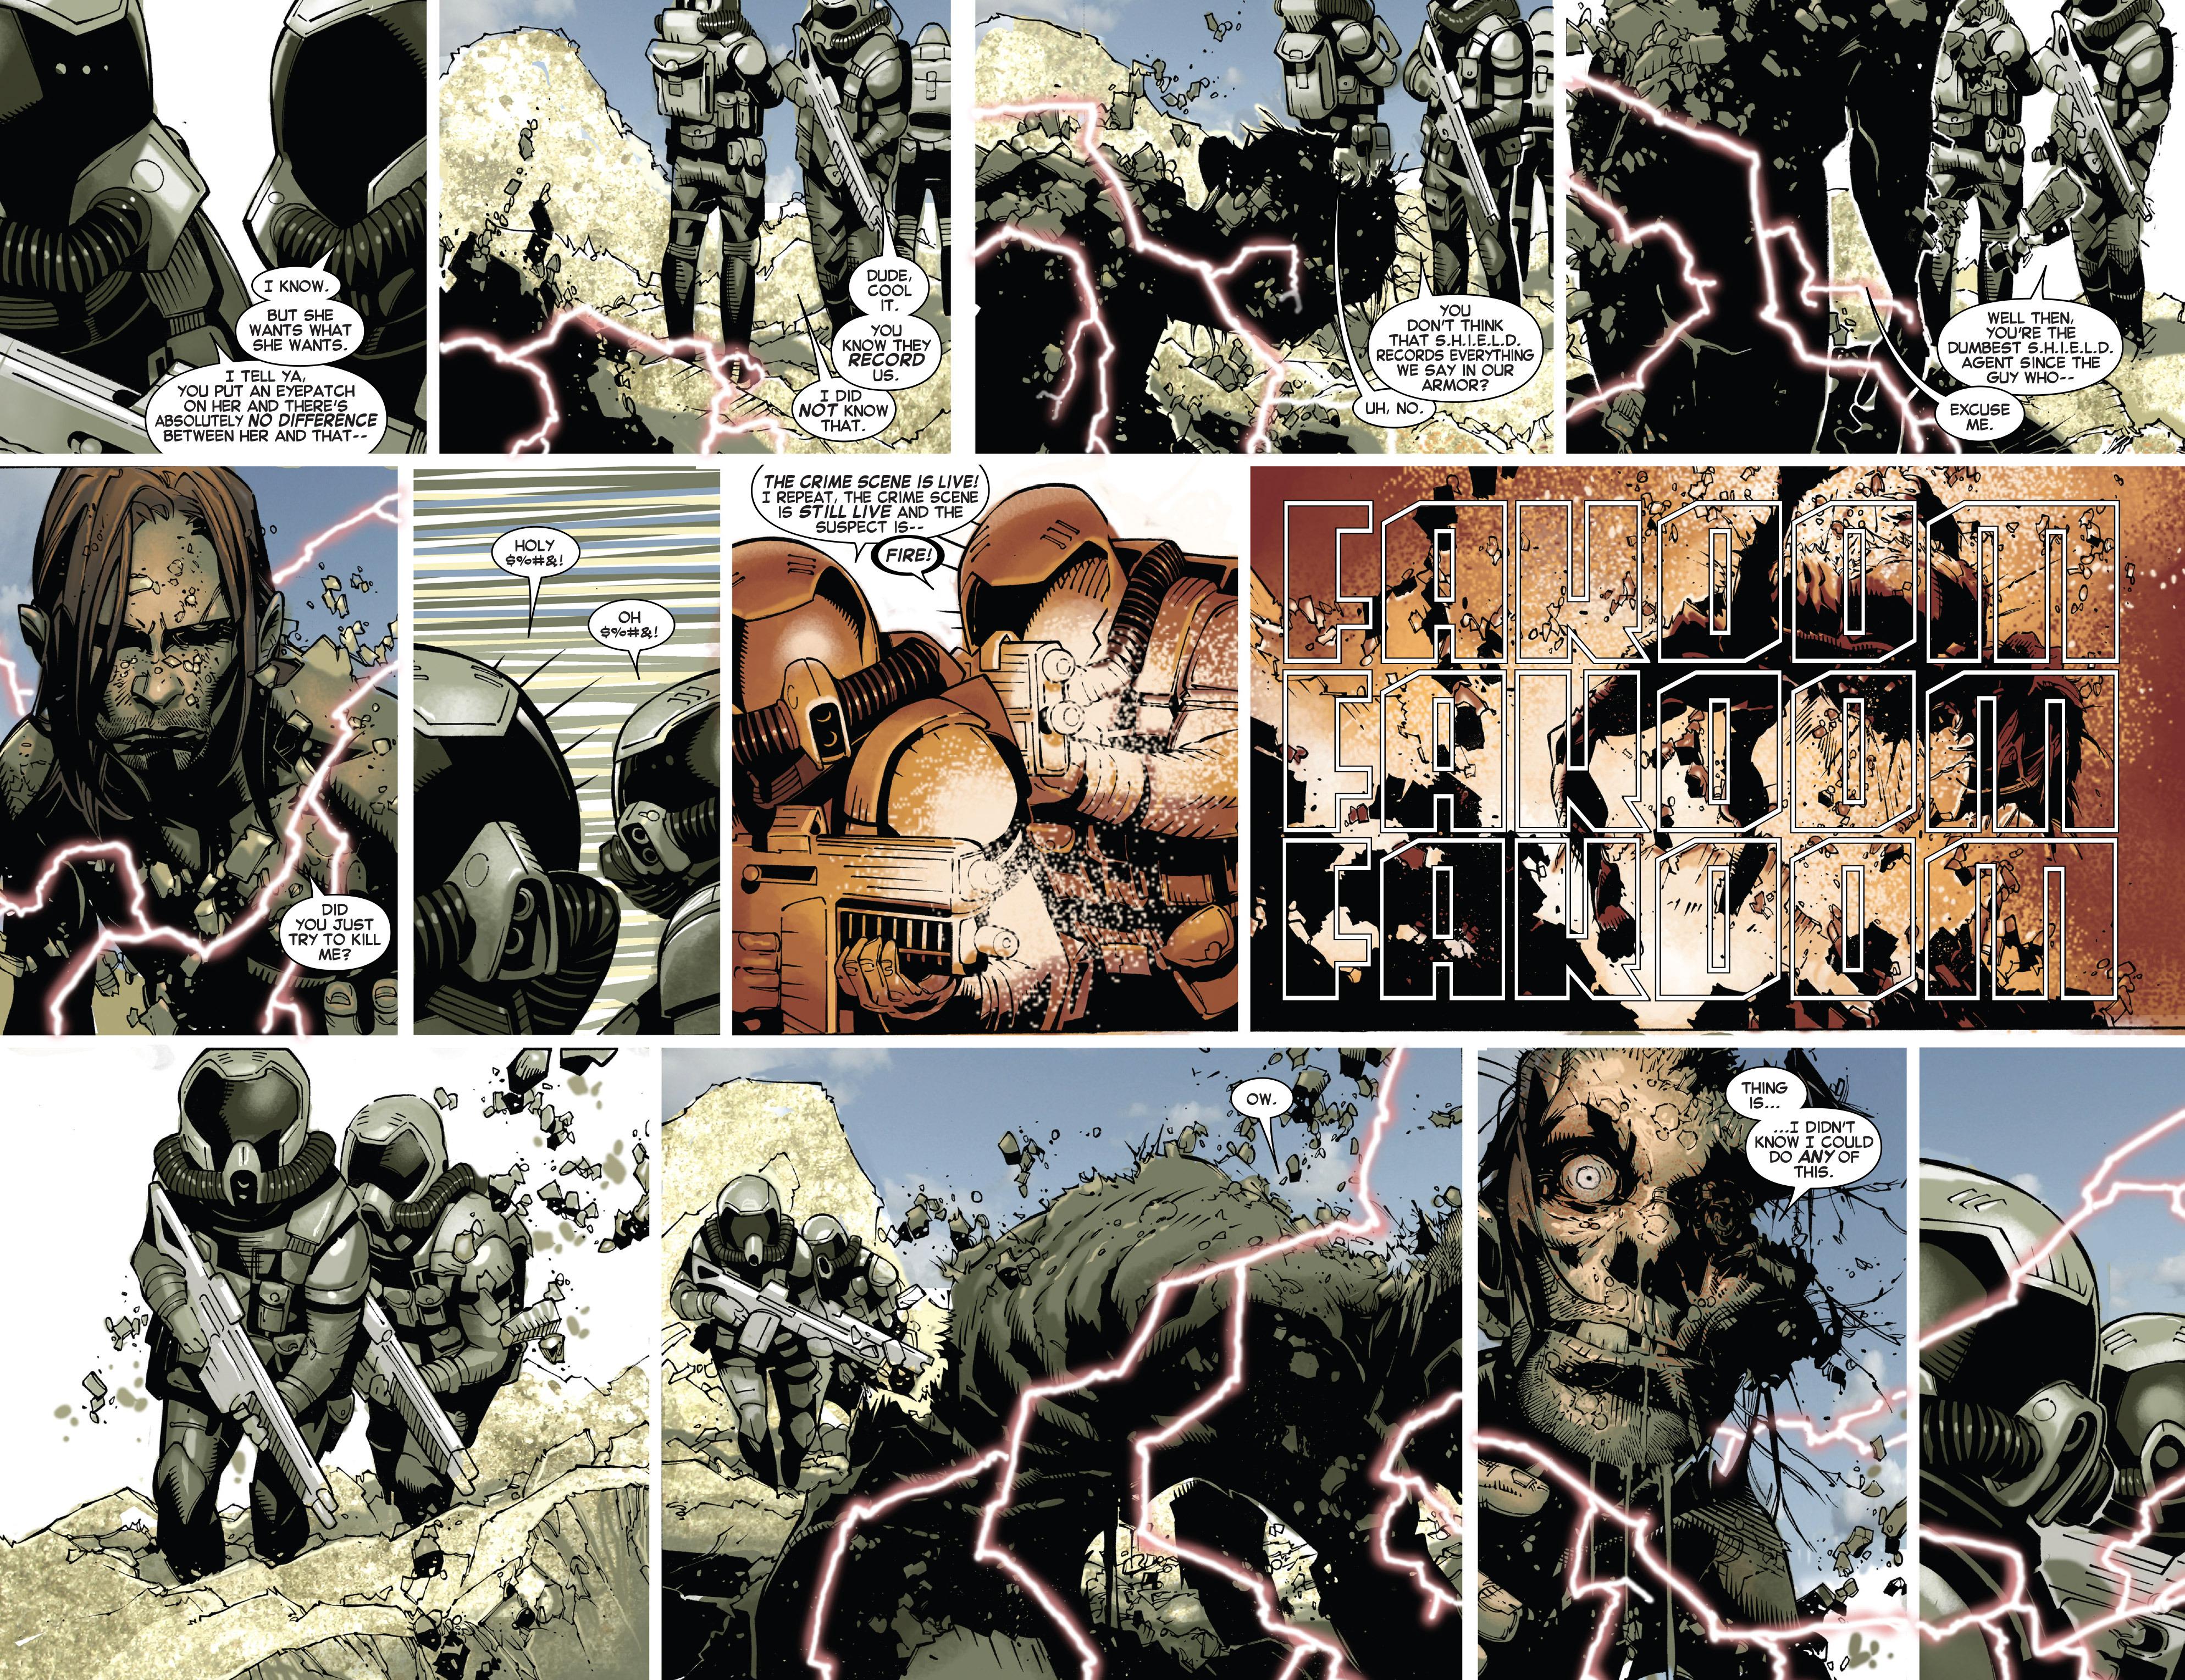 Read online Uncanny X-Men (2013) comic -  Issue # _TPB 5 - The Omega Mutant - 84